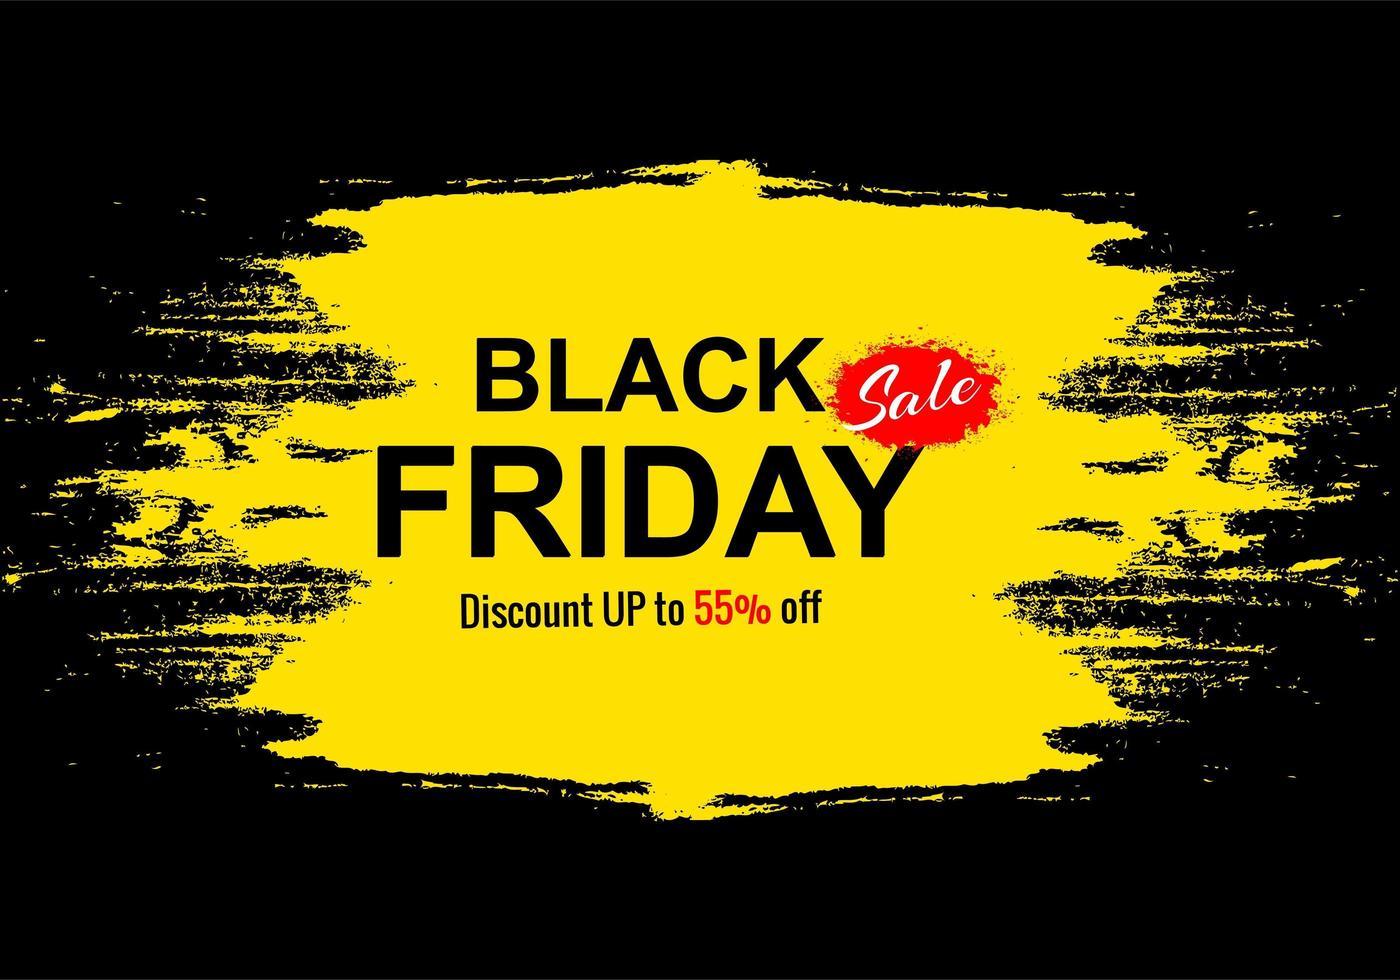 Black Friday Holiday Sale for Grunge Banner Background vector